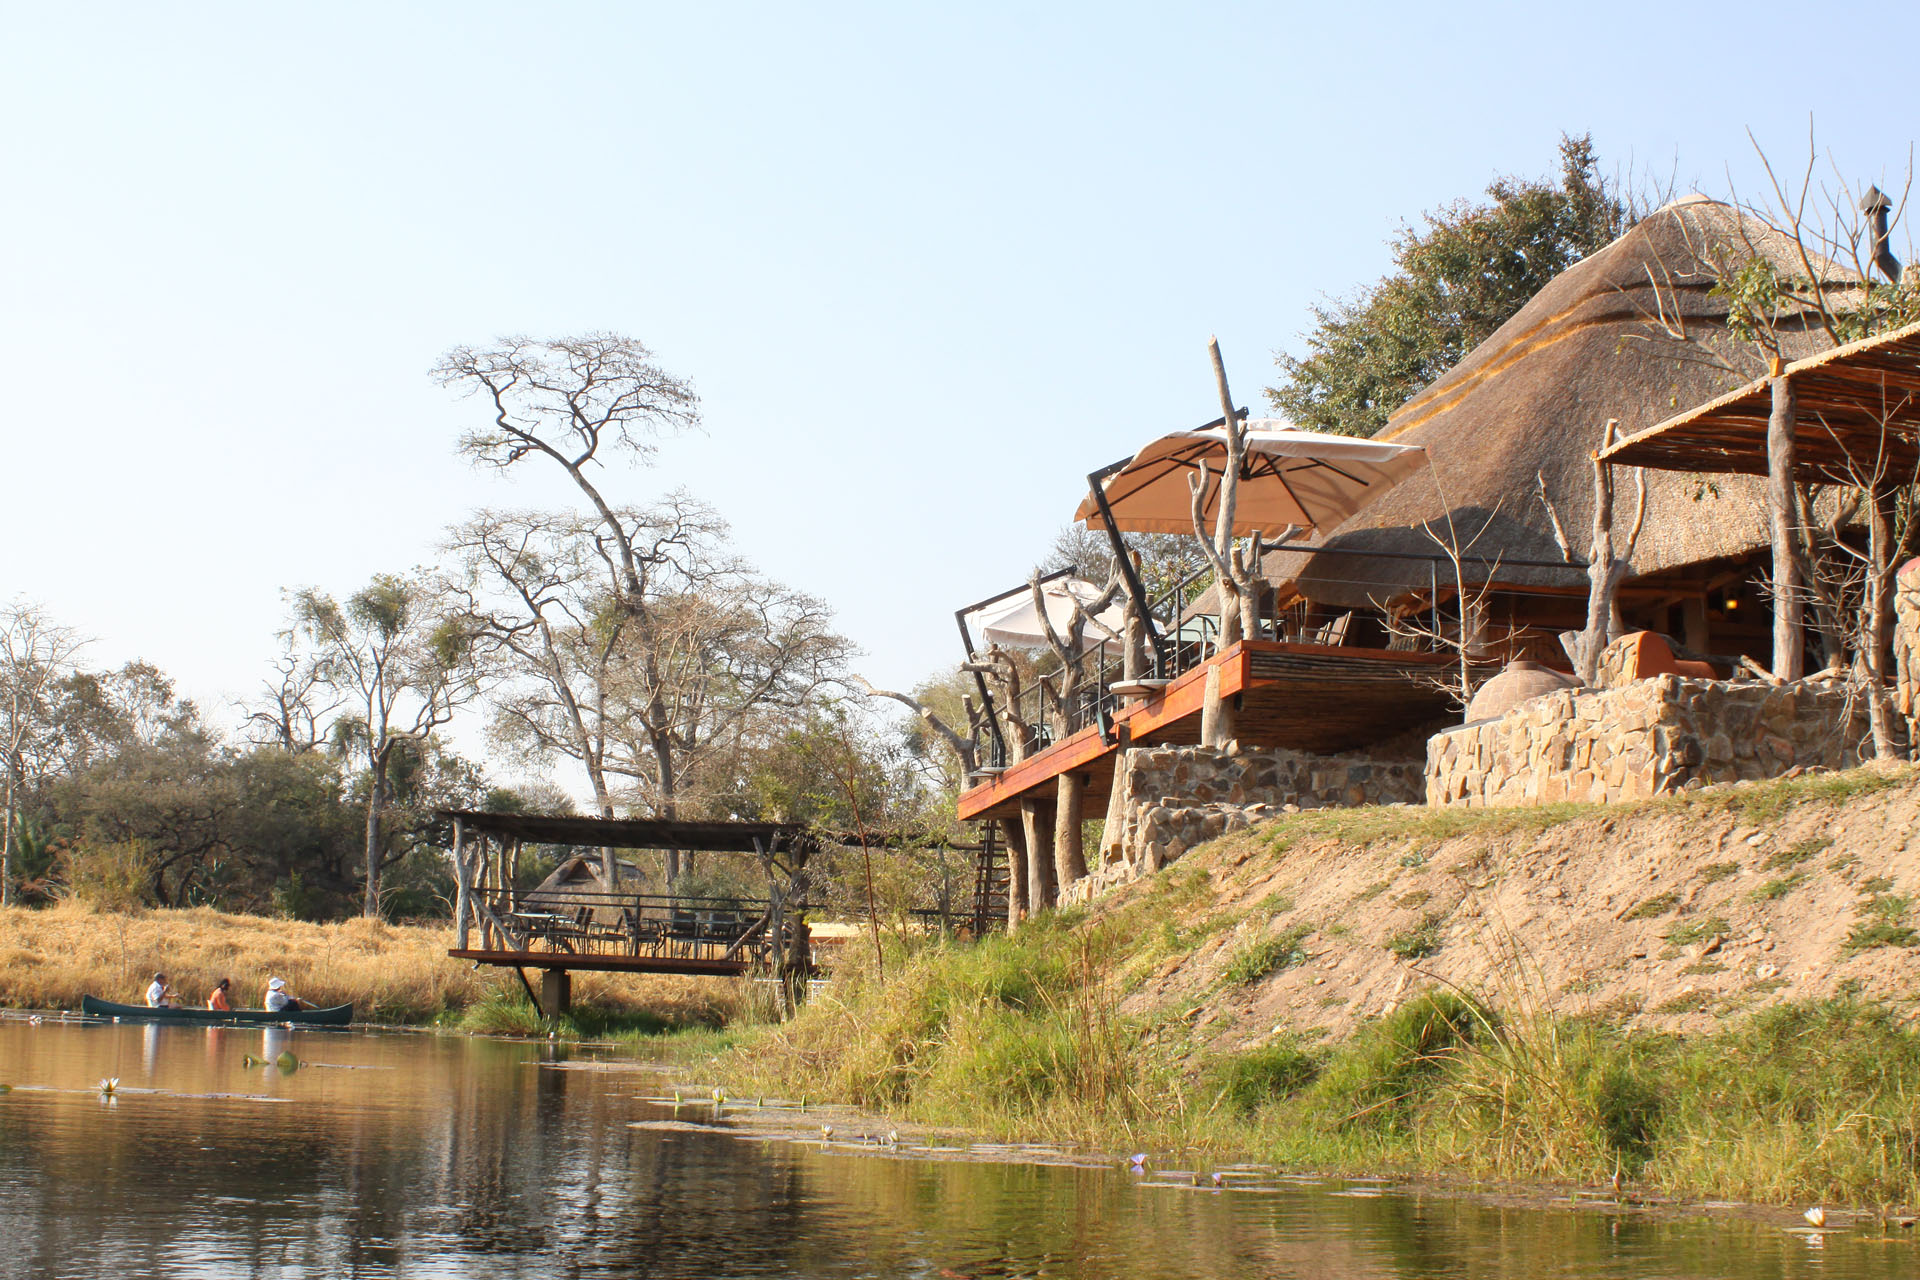 Image source: Pamuzinda Lodge